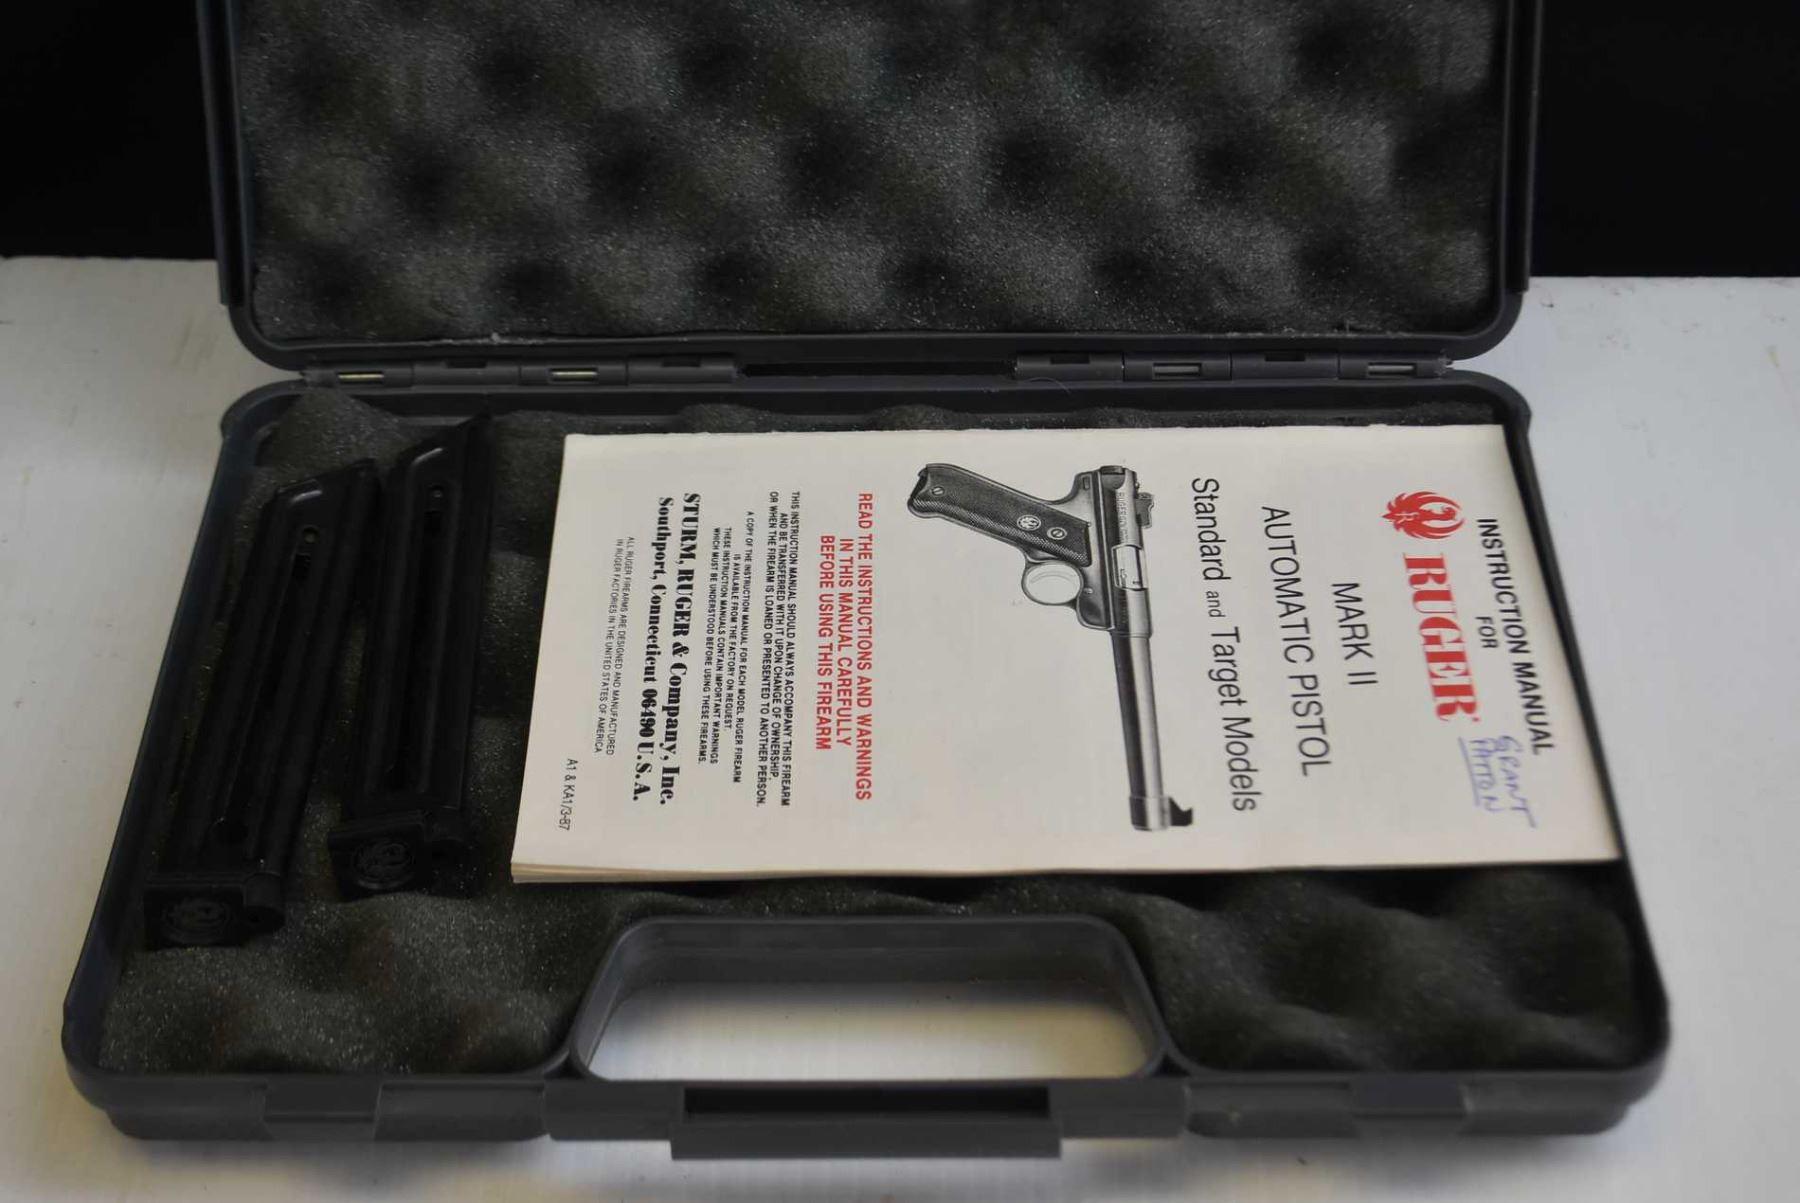 Foam lined hard pistol case with Ruger MK II owner's manual